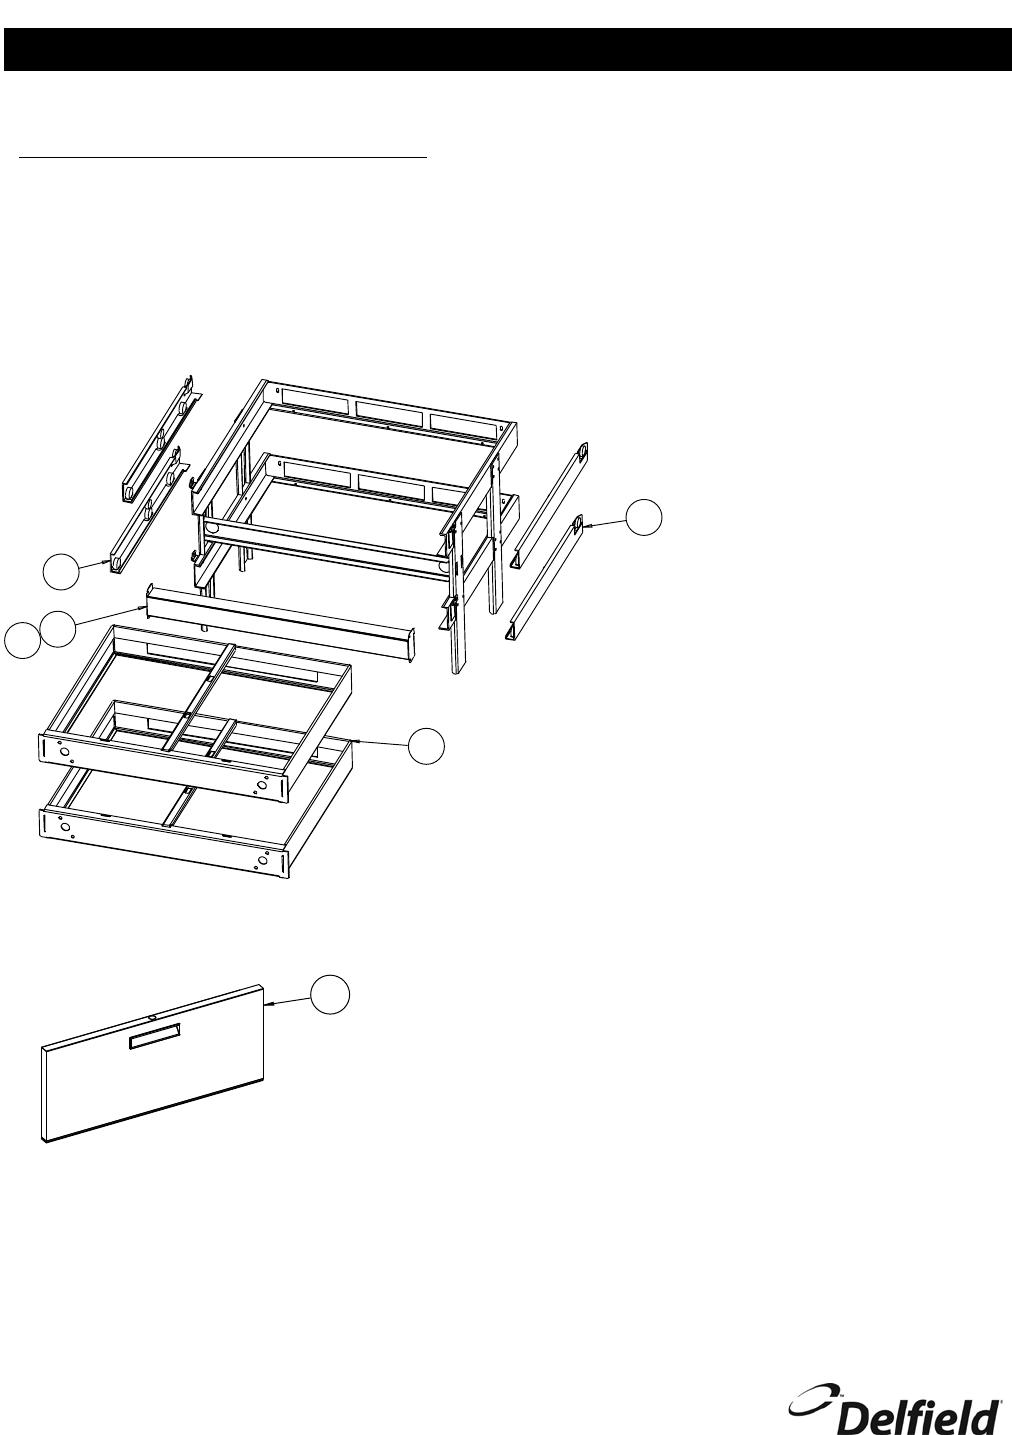 [QNCB_7524]  Delfield Enodis 400 Series Users Manual   Delfield Freezer Wiring Diagram Mini      UserManual.wiki